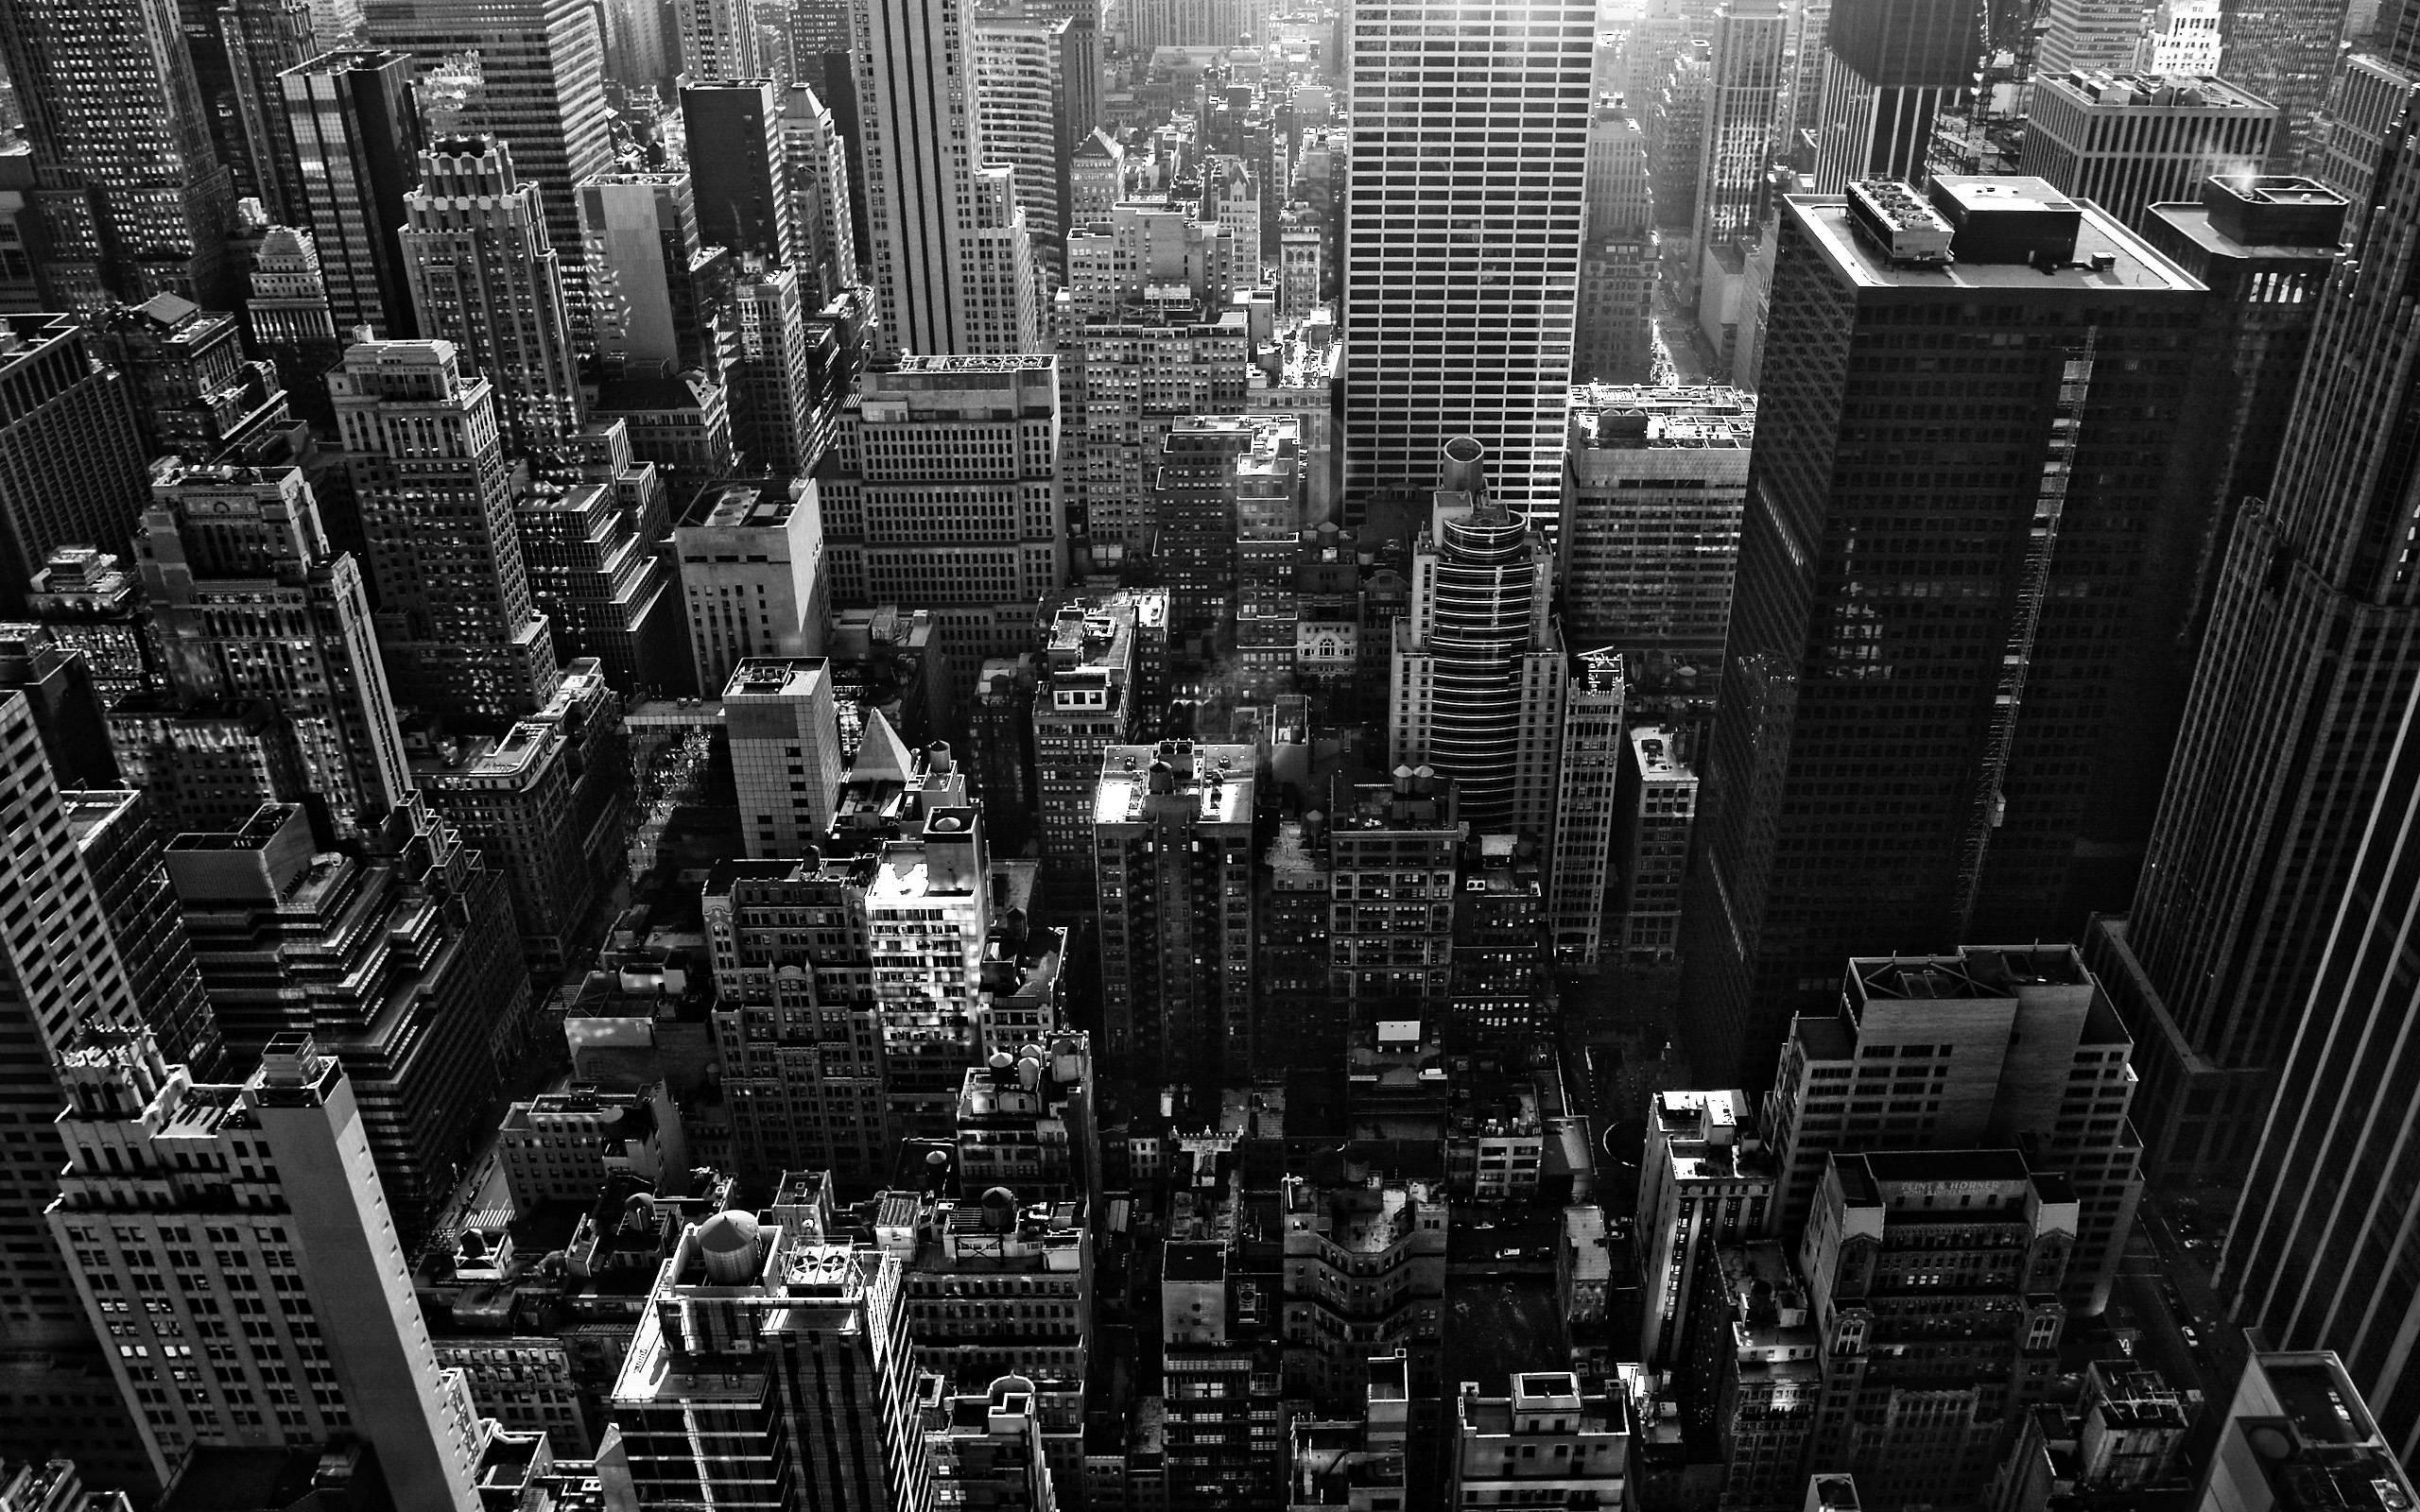 Fonds d'écran Wall Street : tous les wallpapers Wall Street